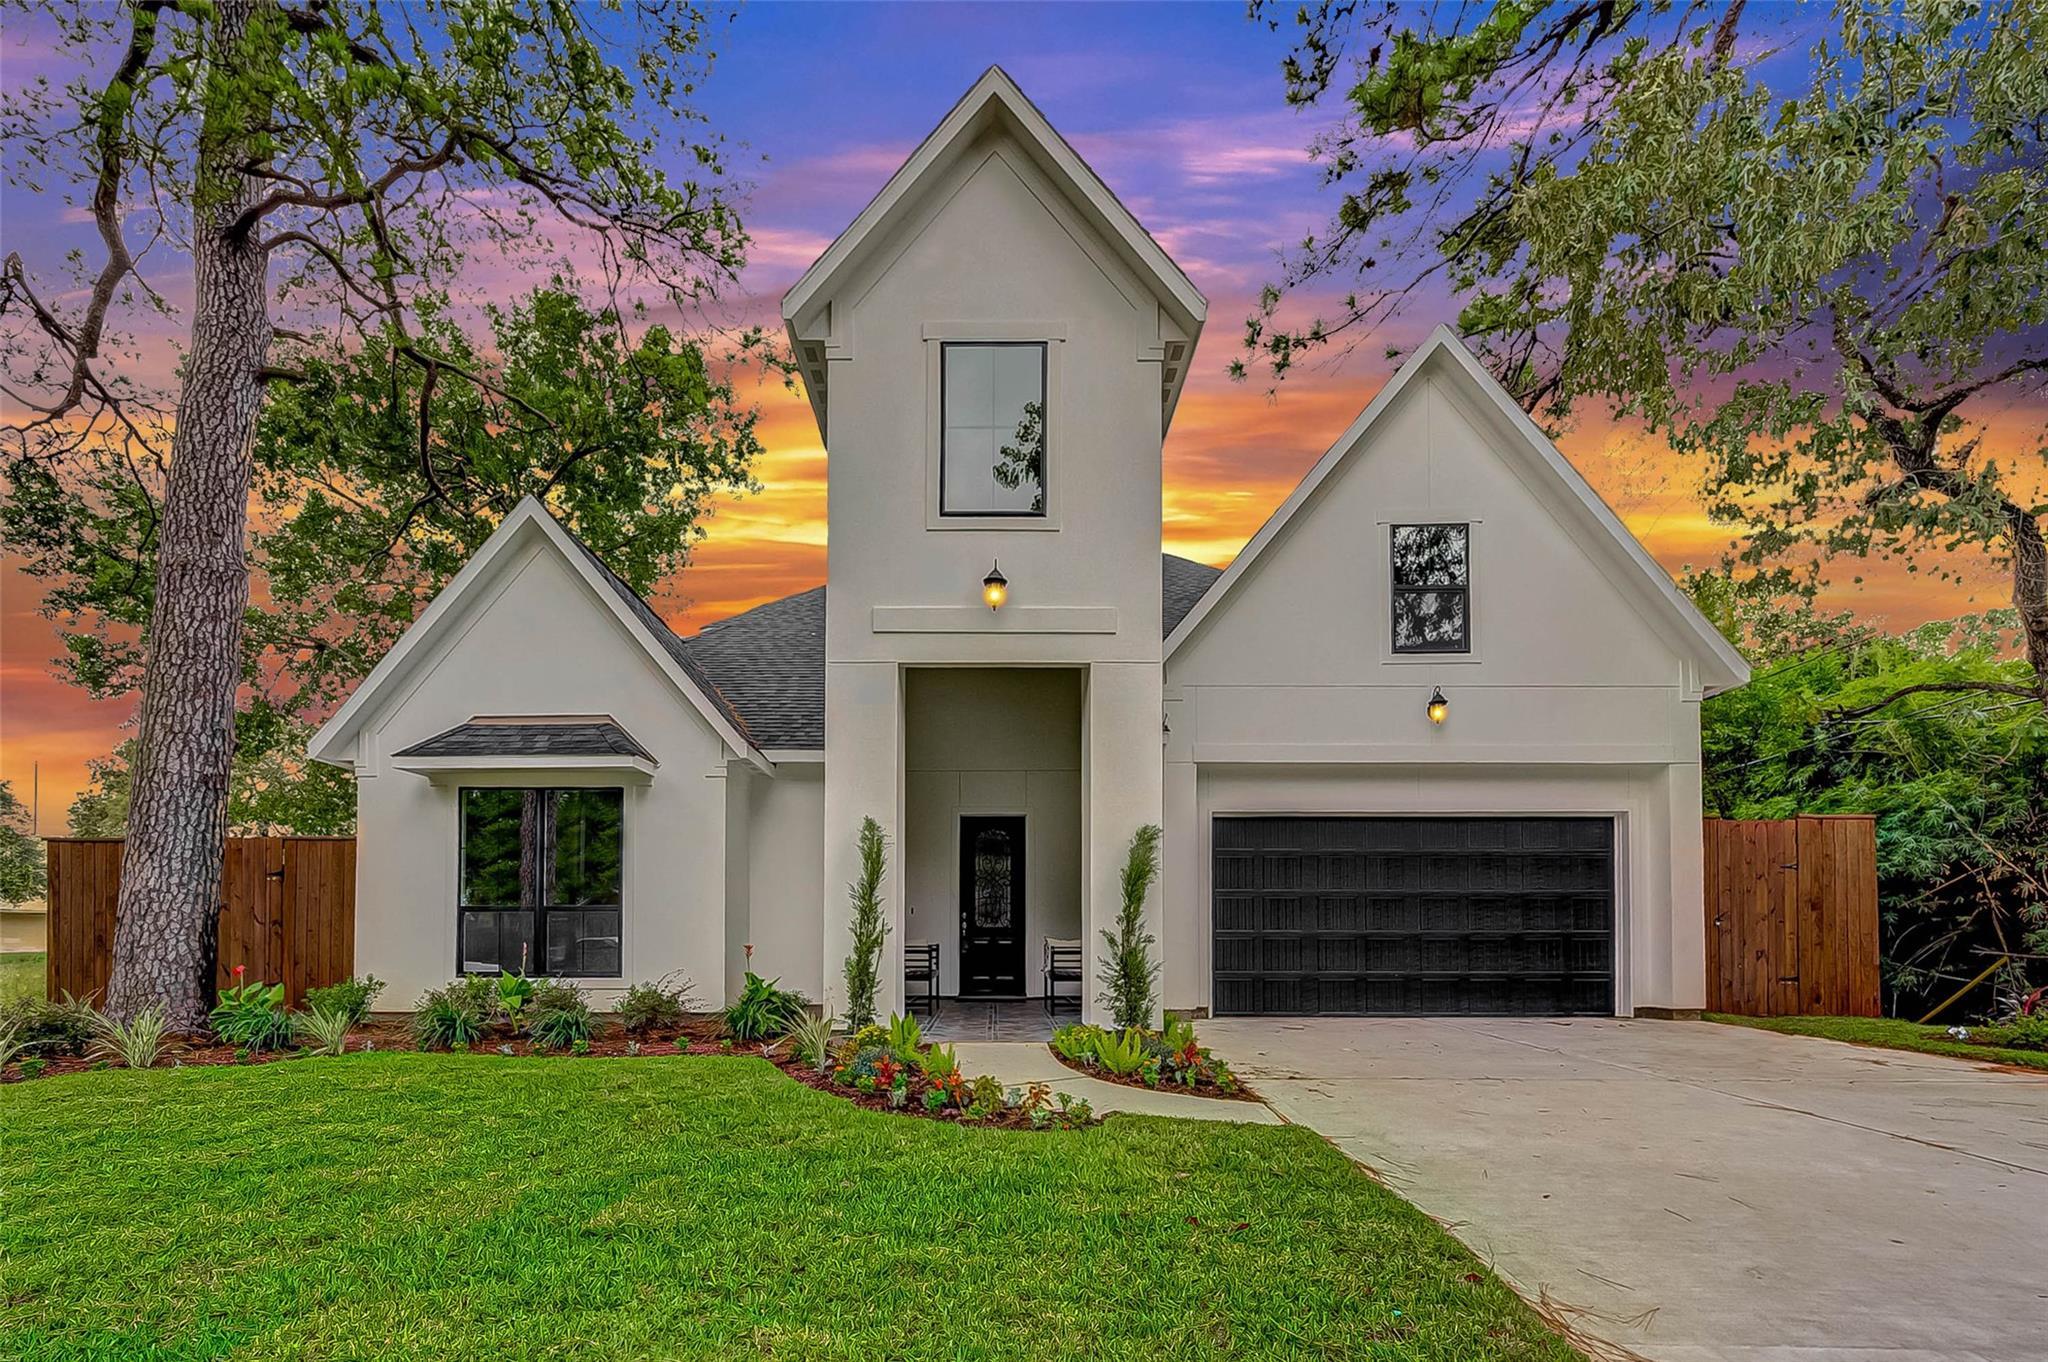 705 W 42nd st Street Property Photo - Houston, TX real estate listing